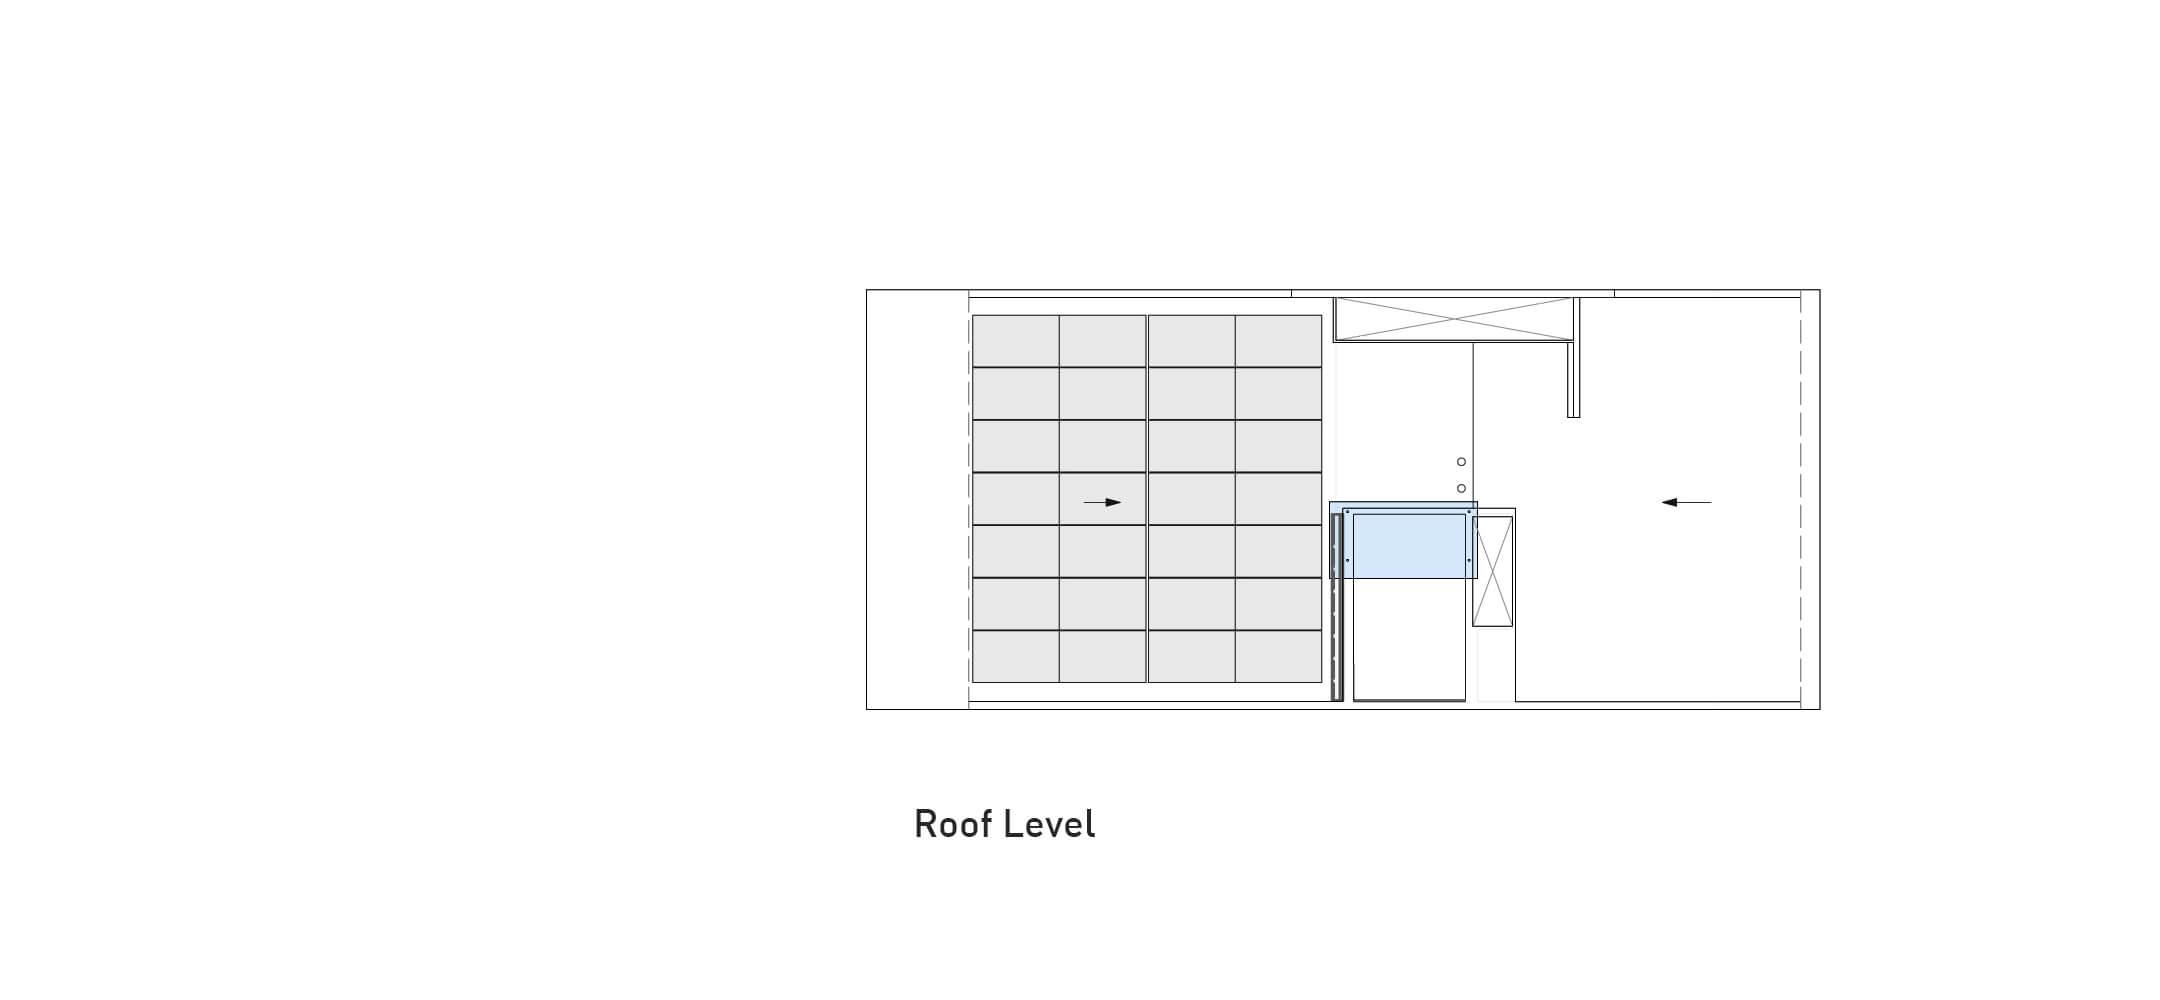 Choy Presentation1 _ 2. Roof Pl